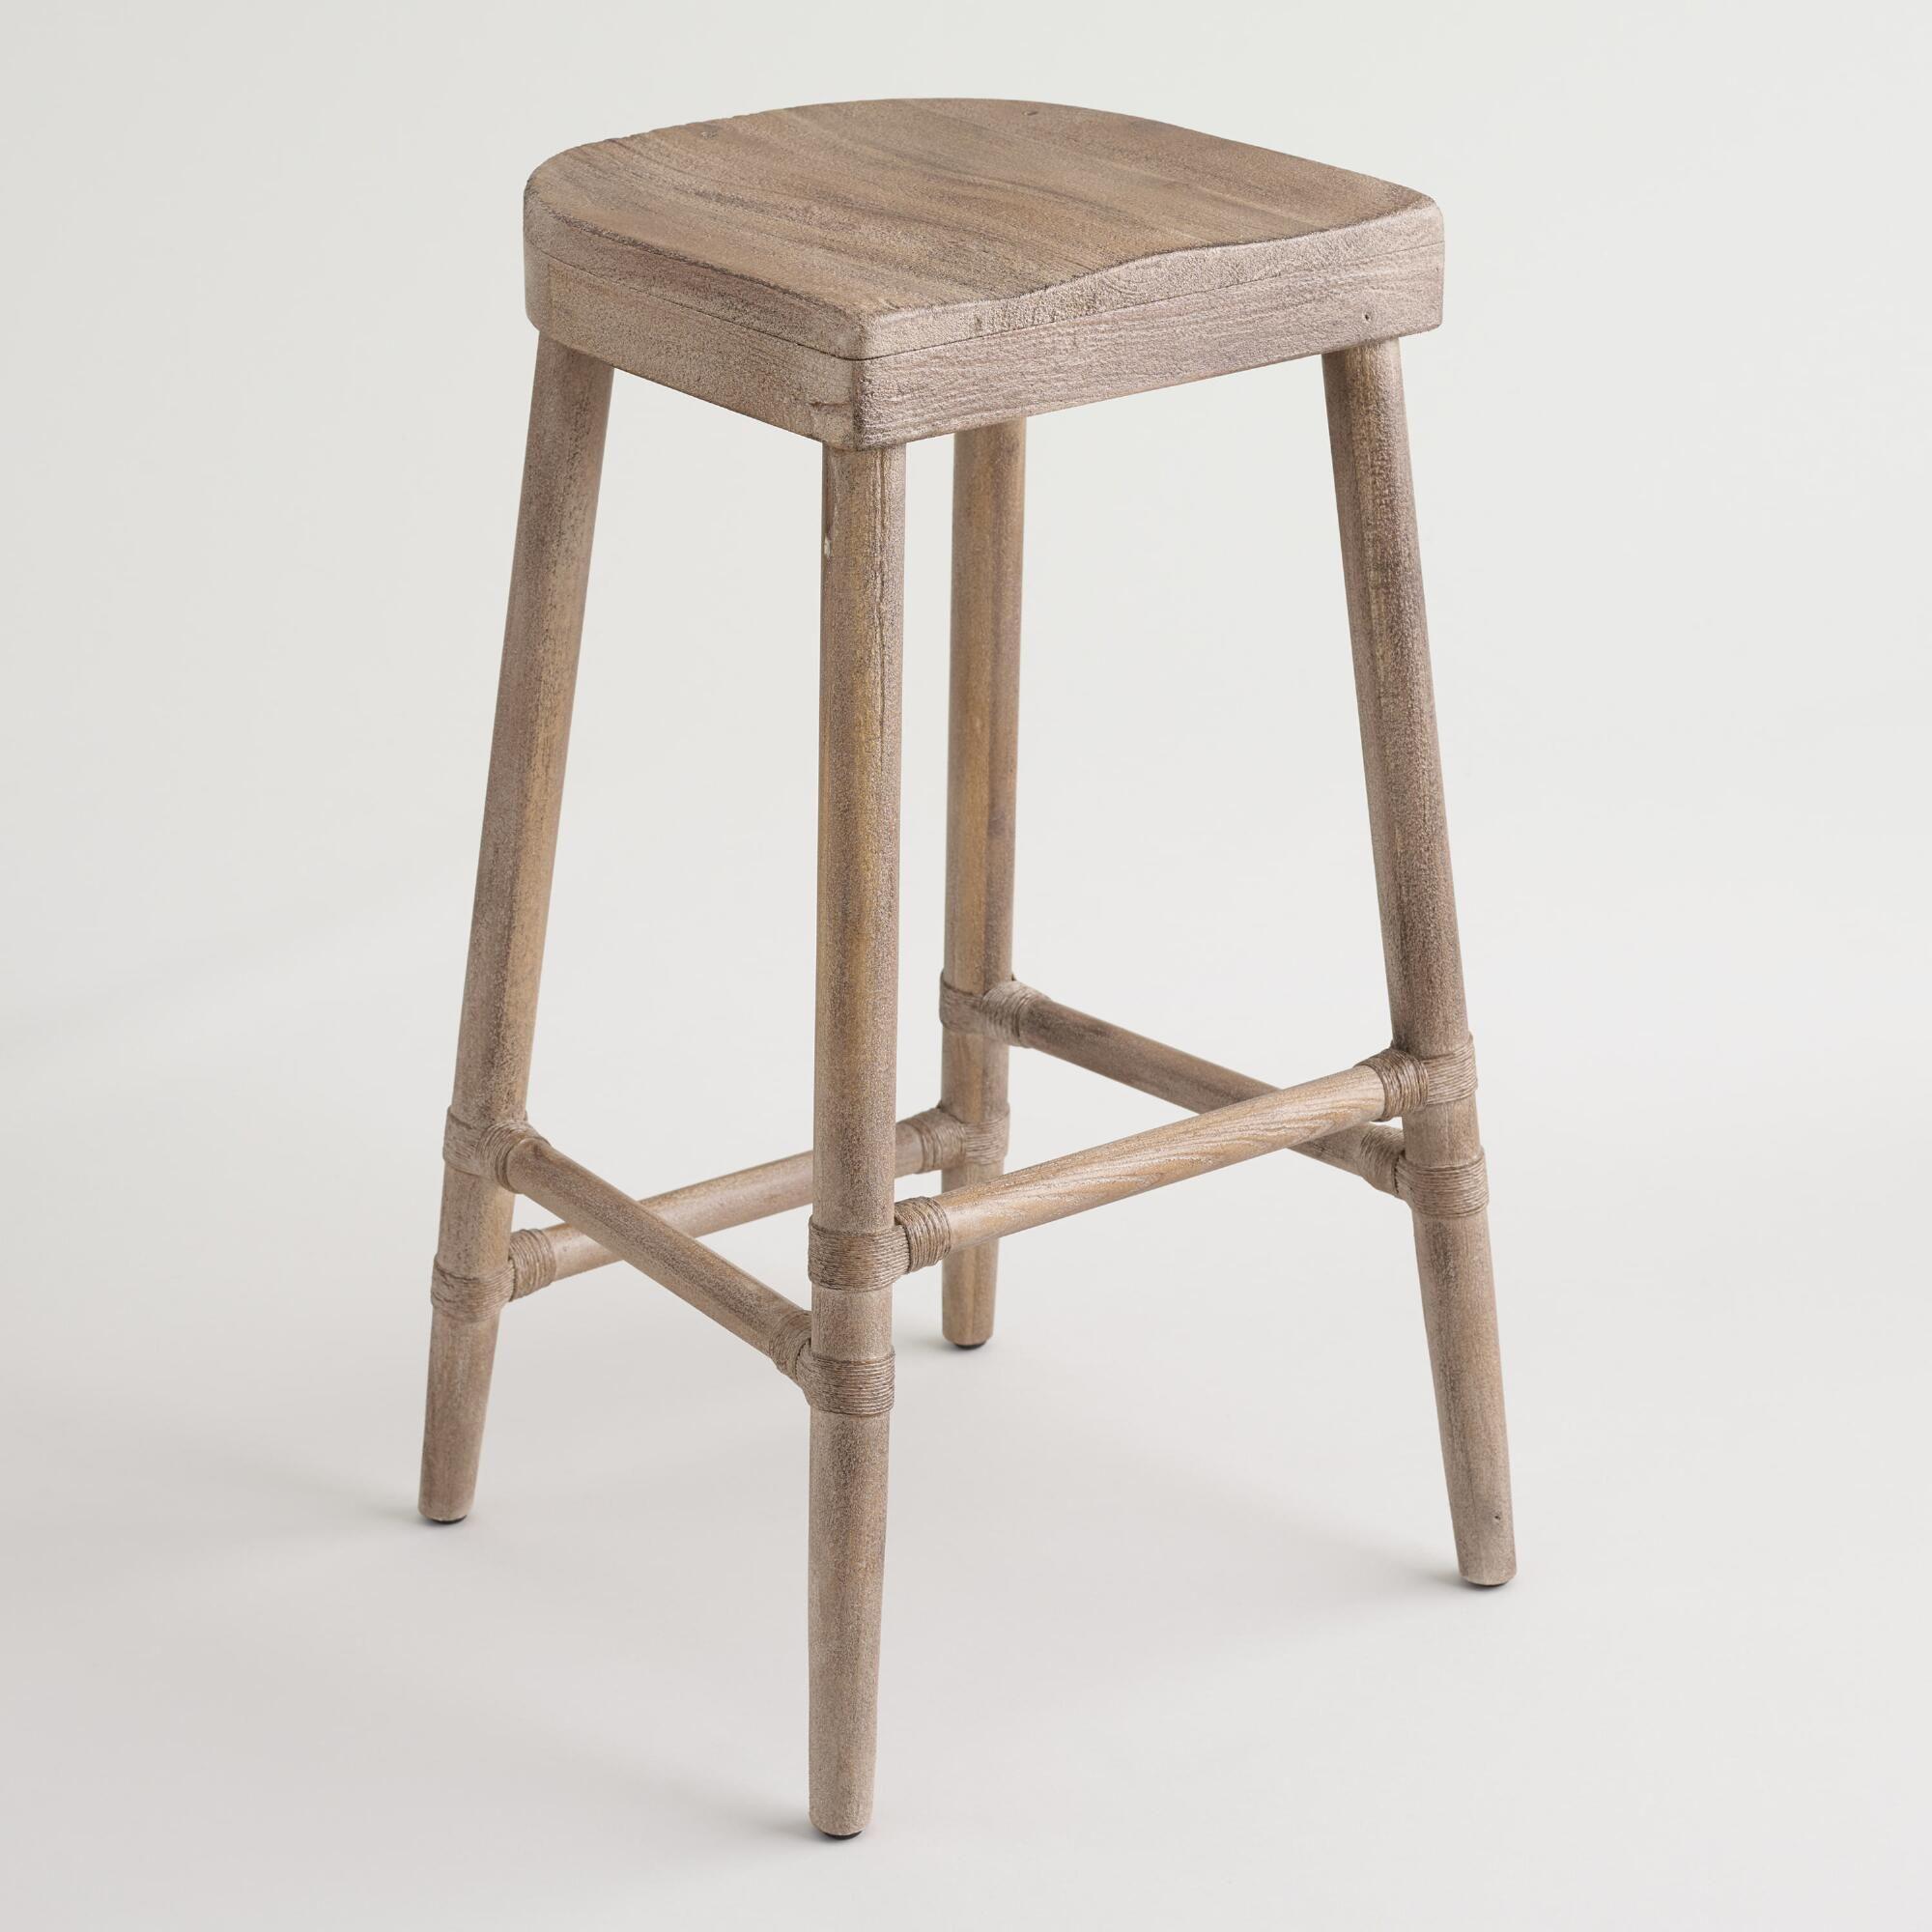 Gray Wood Kaja Barstool With Saddle Seat Wood Bar Stools Wood Counter Stools Bar Stools